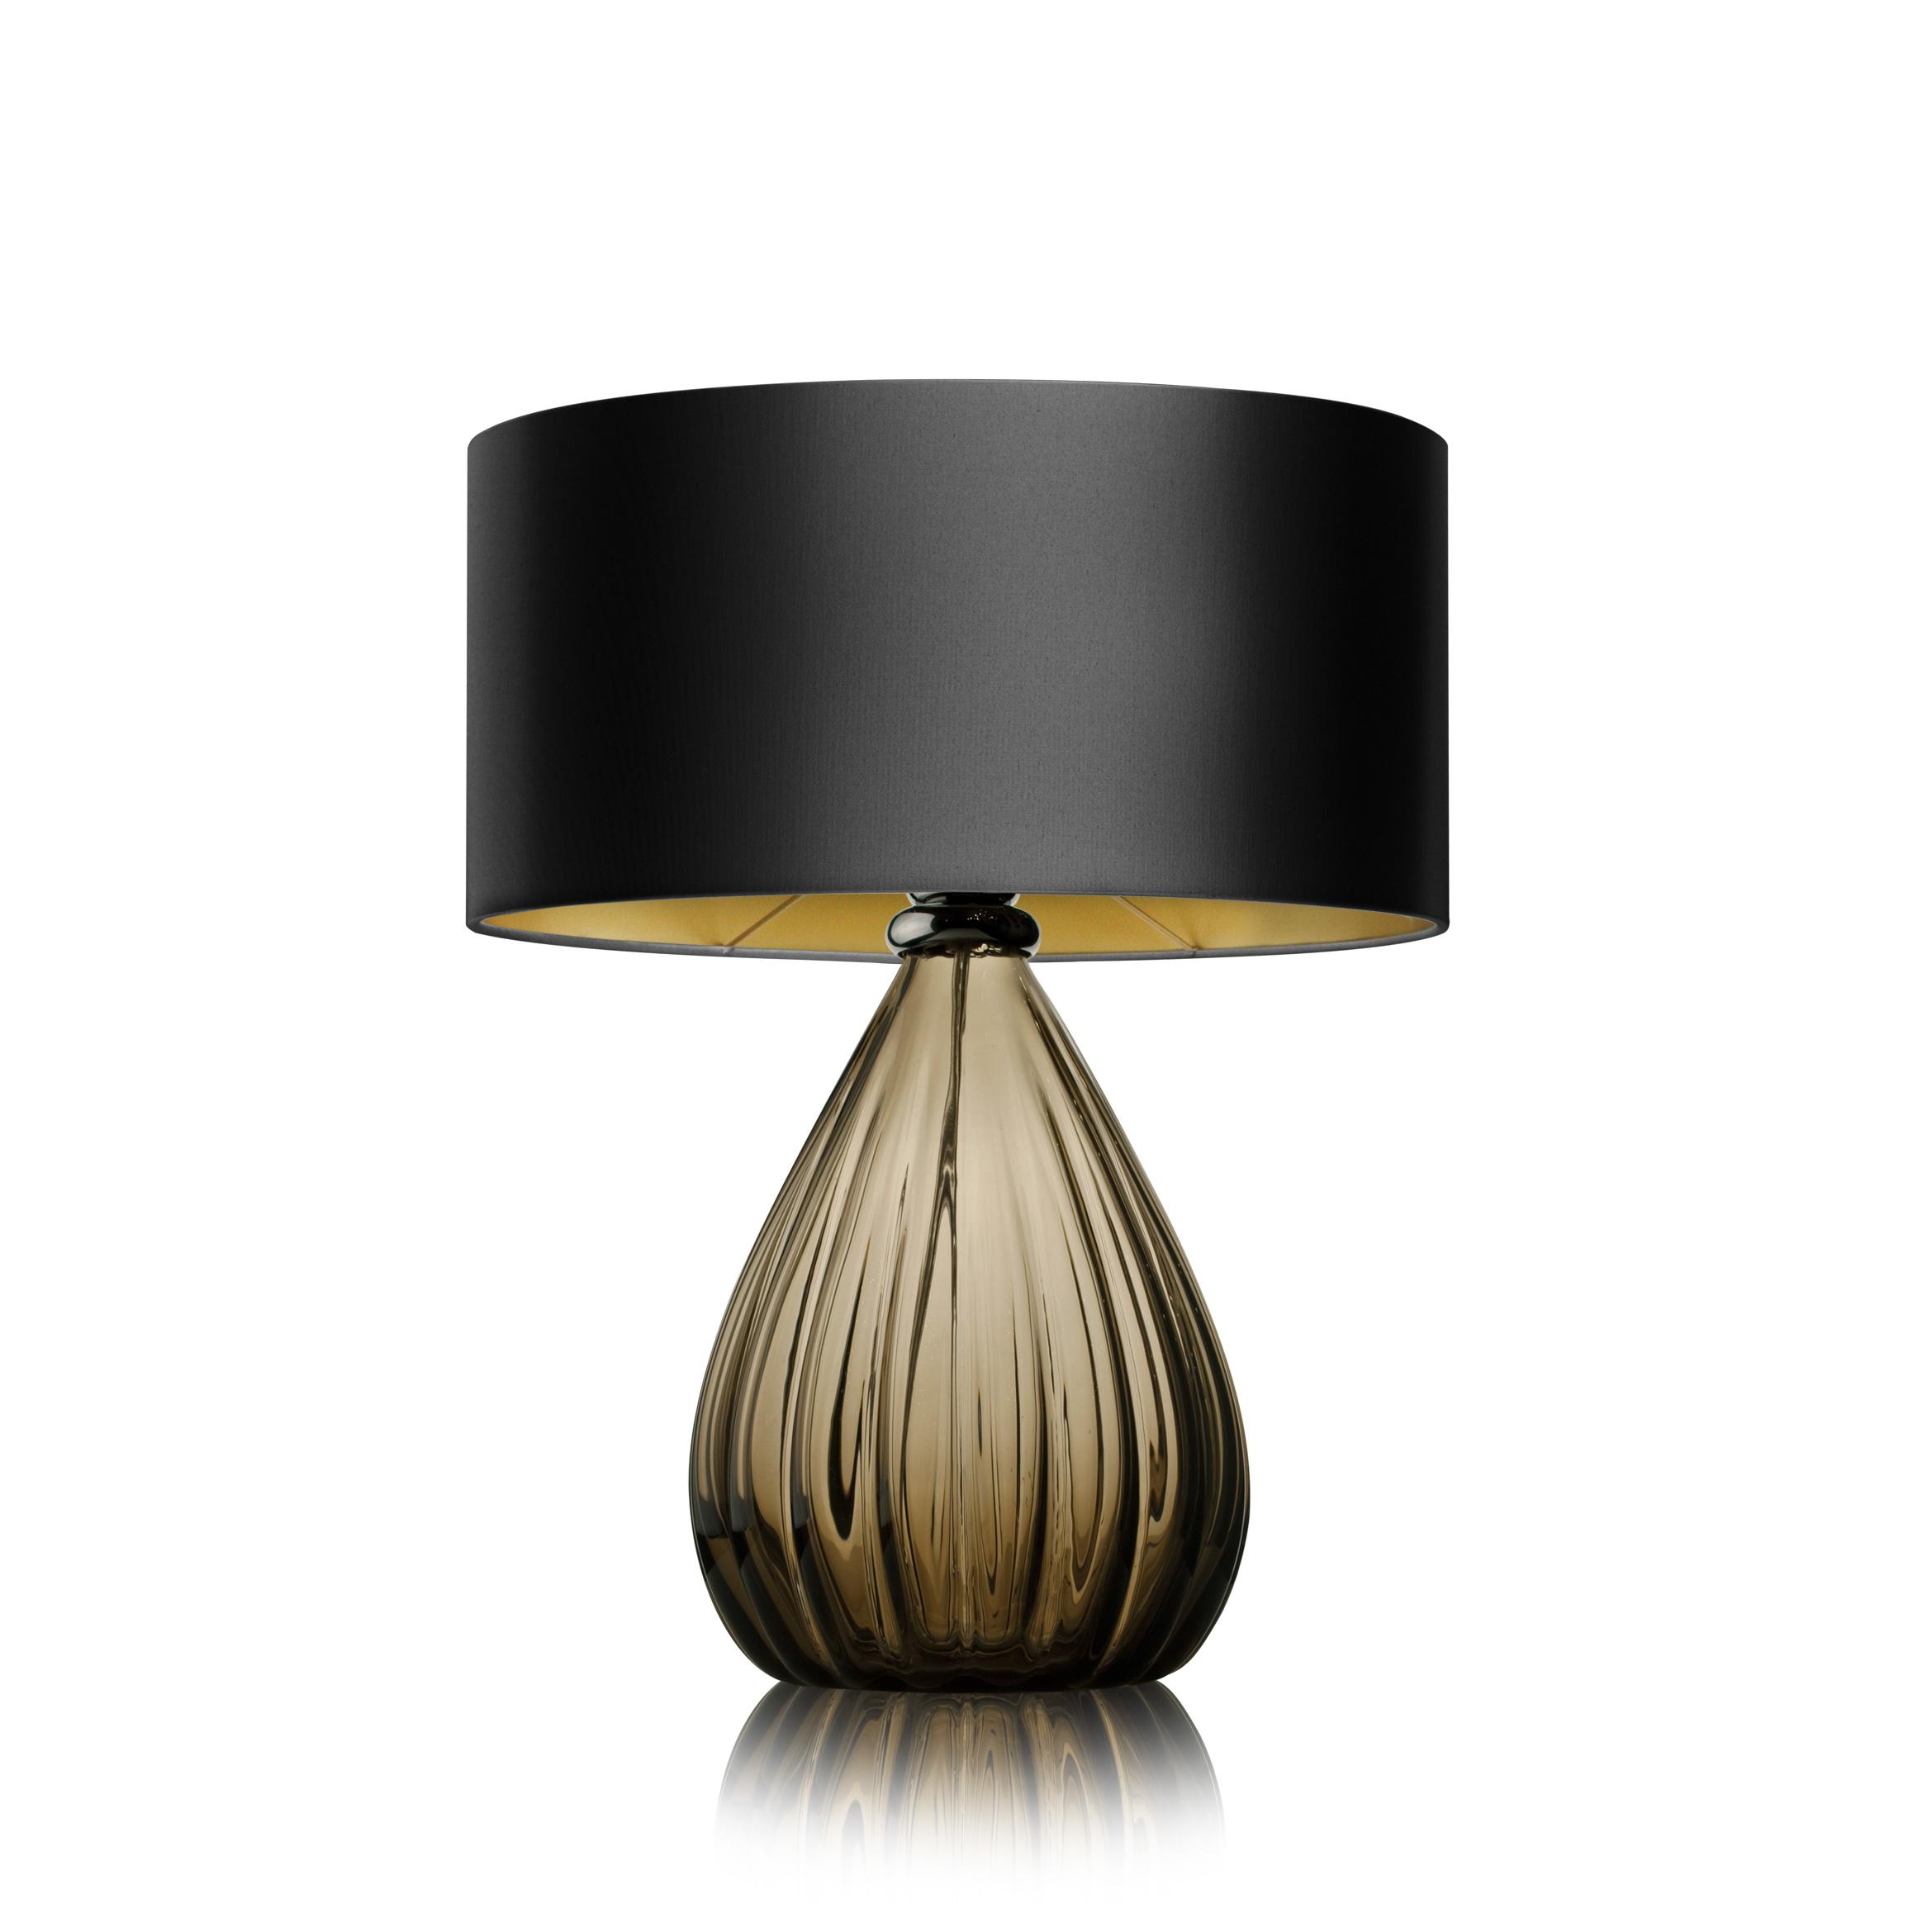 Gemma villaverde london villaverde london gemma murano table lamp fume square aloadofball Gallery